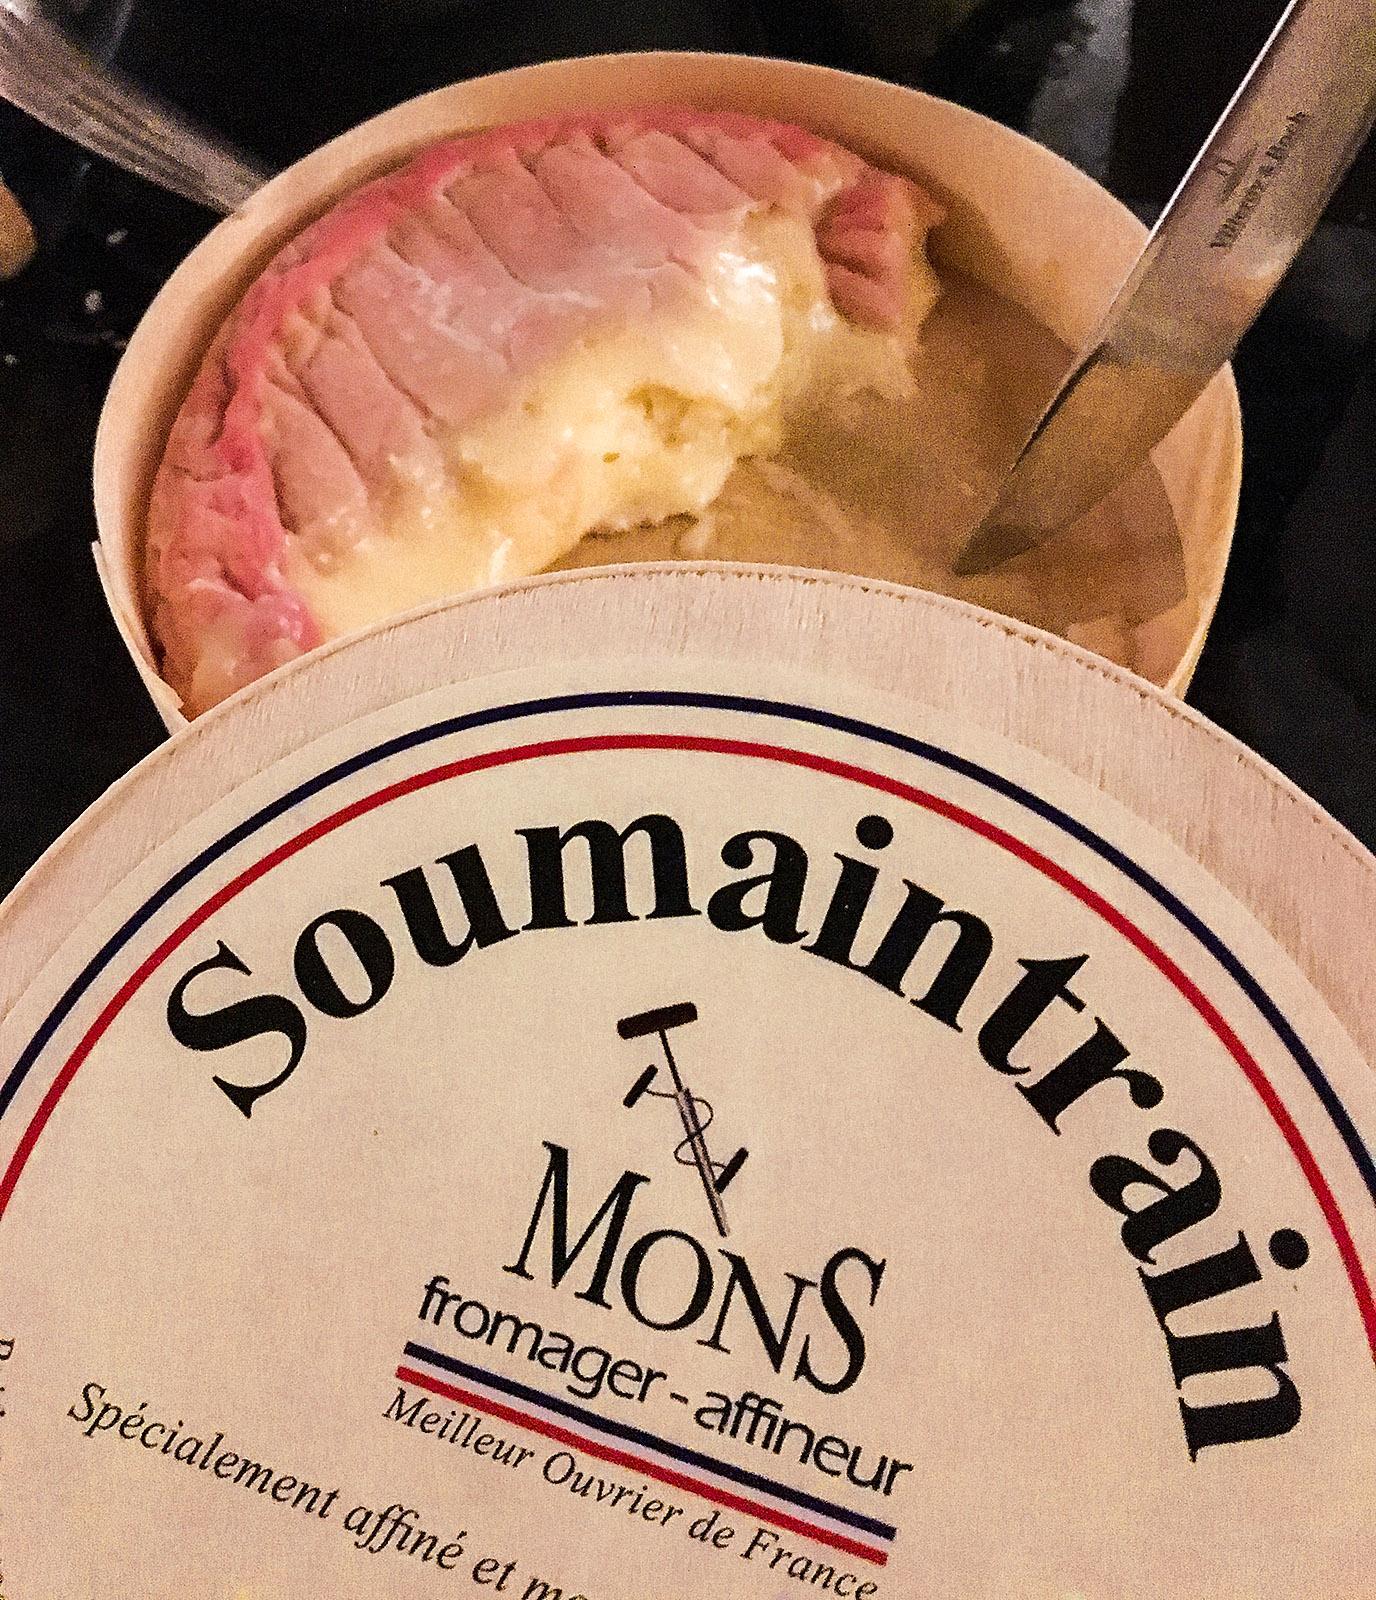 Sens: In einem ehemaligen Eisenbahntunnel lässt Hervé Mons den Käse reifen. Auch der Soumaintrain ist dem Käse-Veredler perfekt gelungen. Foto: Hilke Maunder